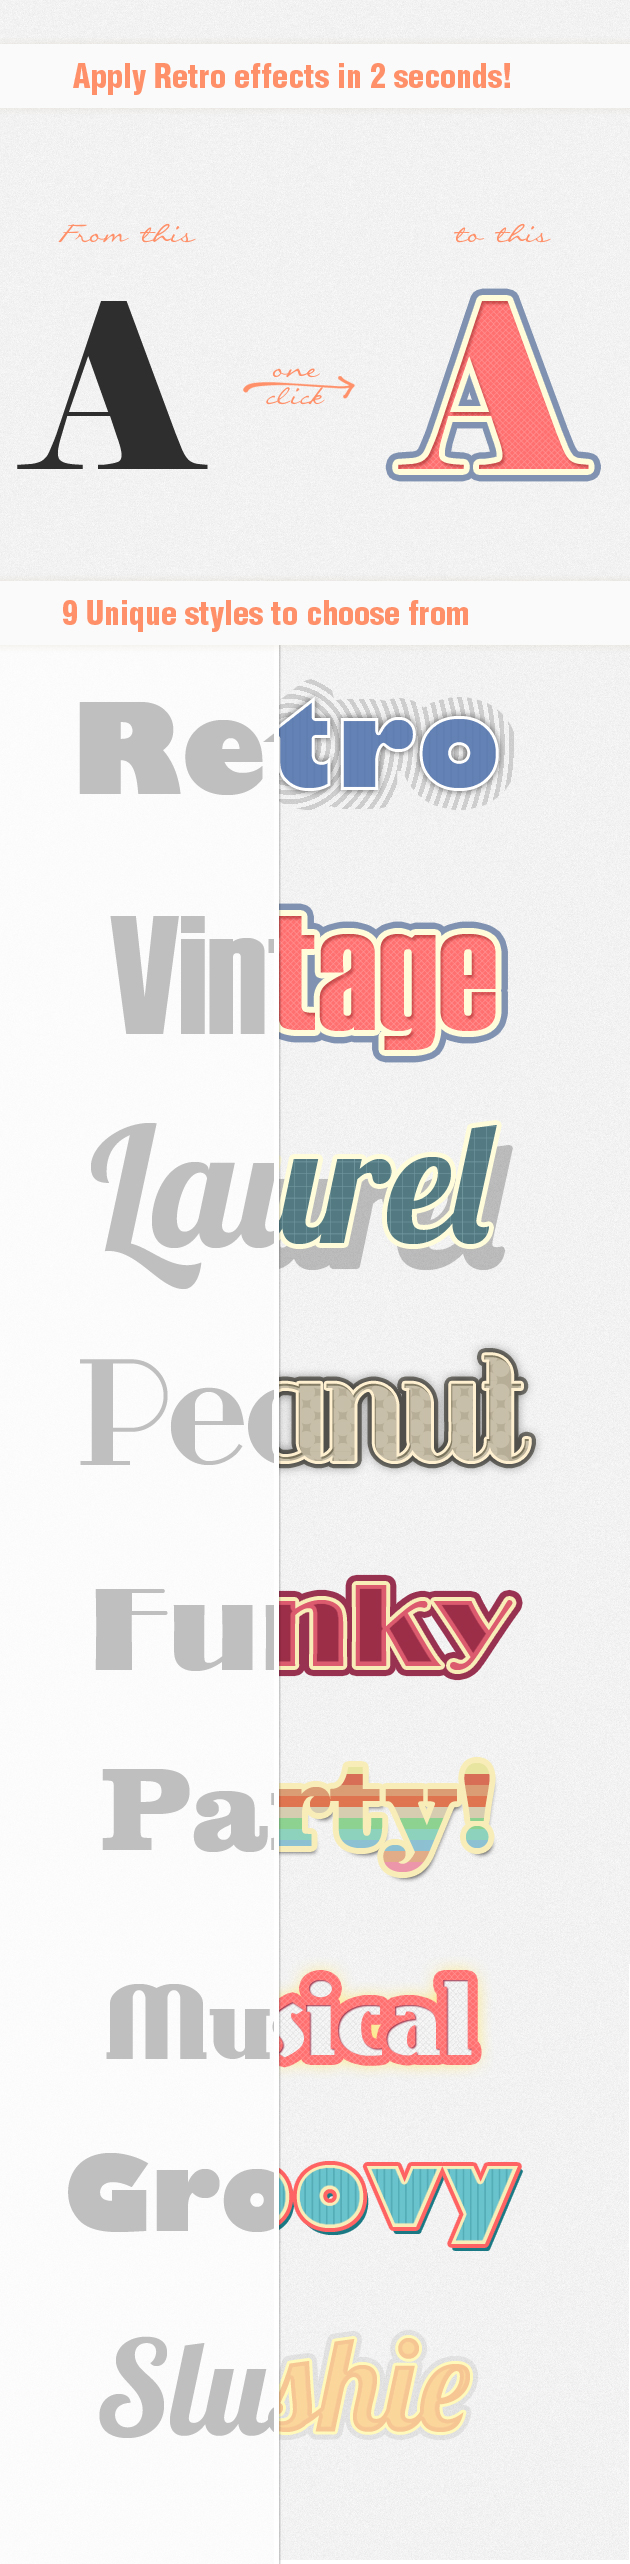 Retro-Text-Styles-Set-2 designtnt retro styles 2 large